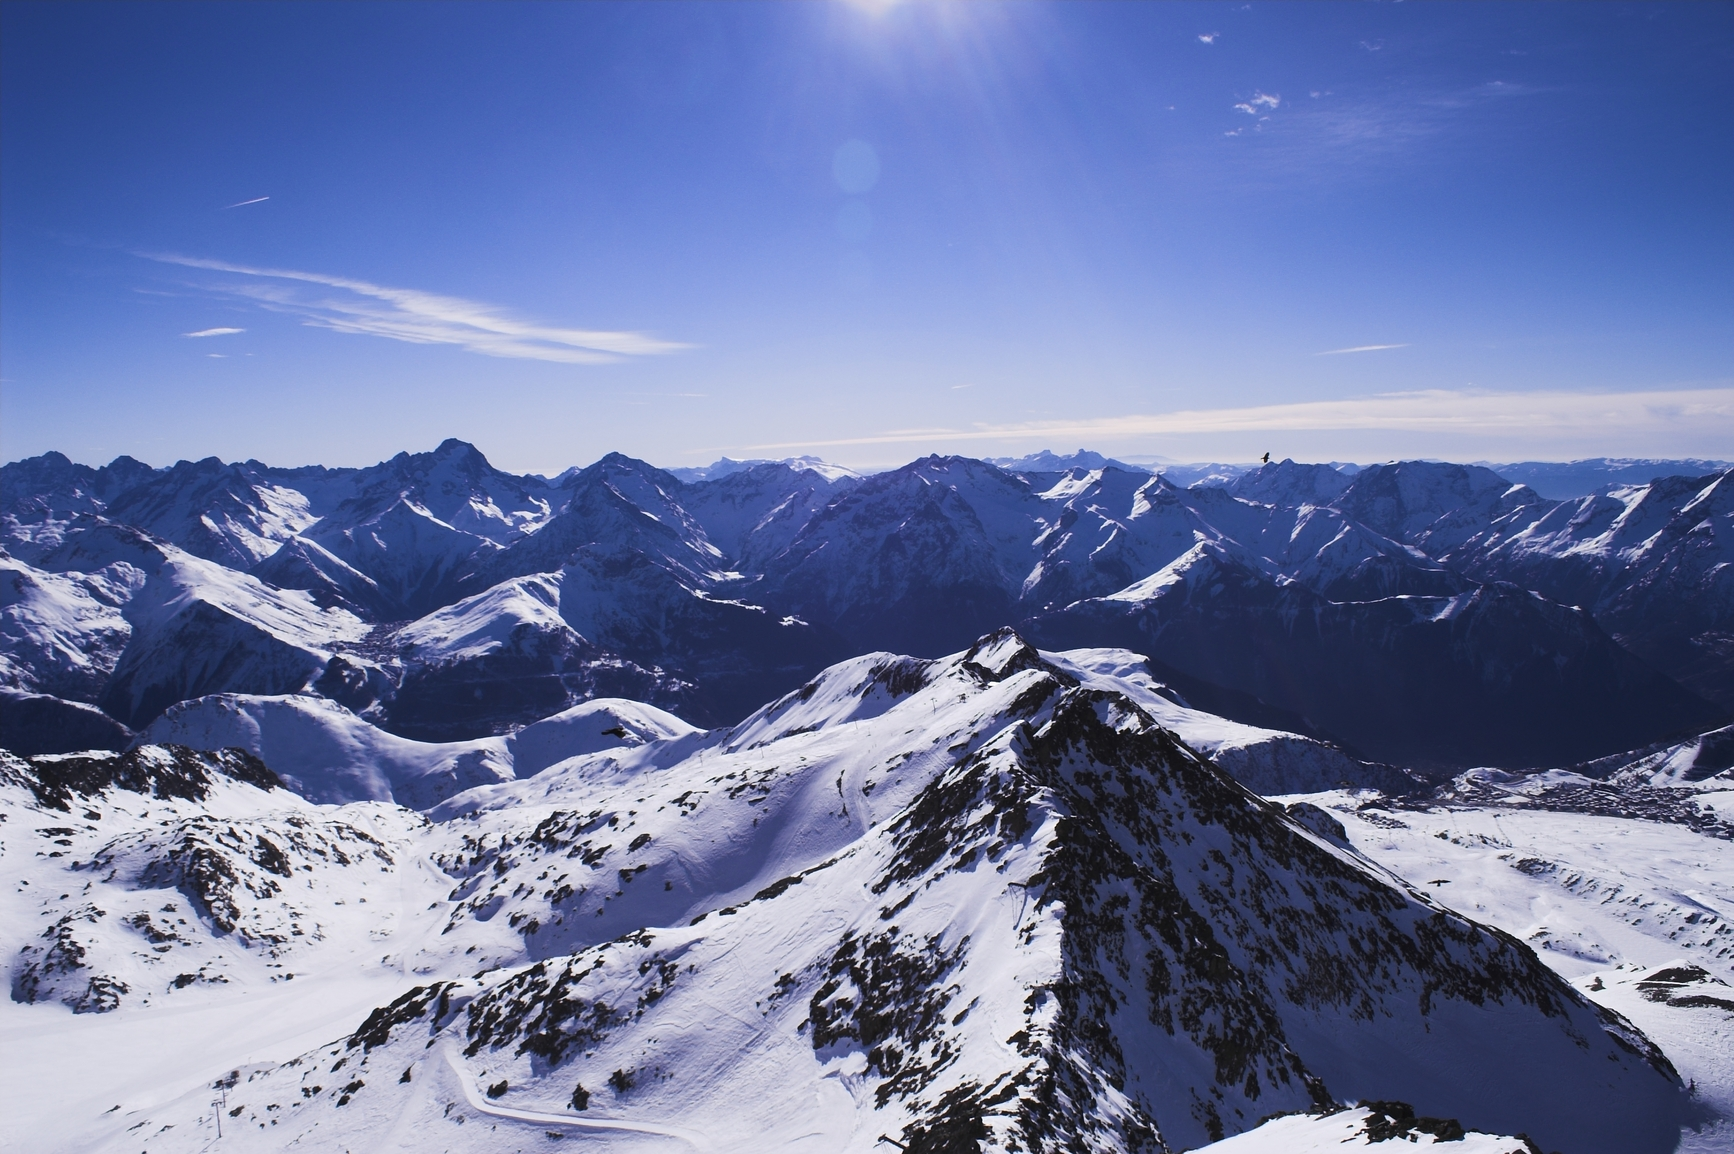 photodune-3636702-ski-vacation-in-alpes-m.jpg